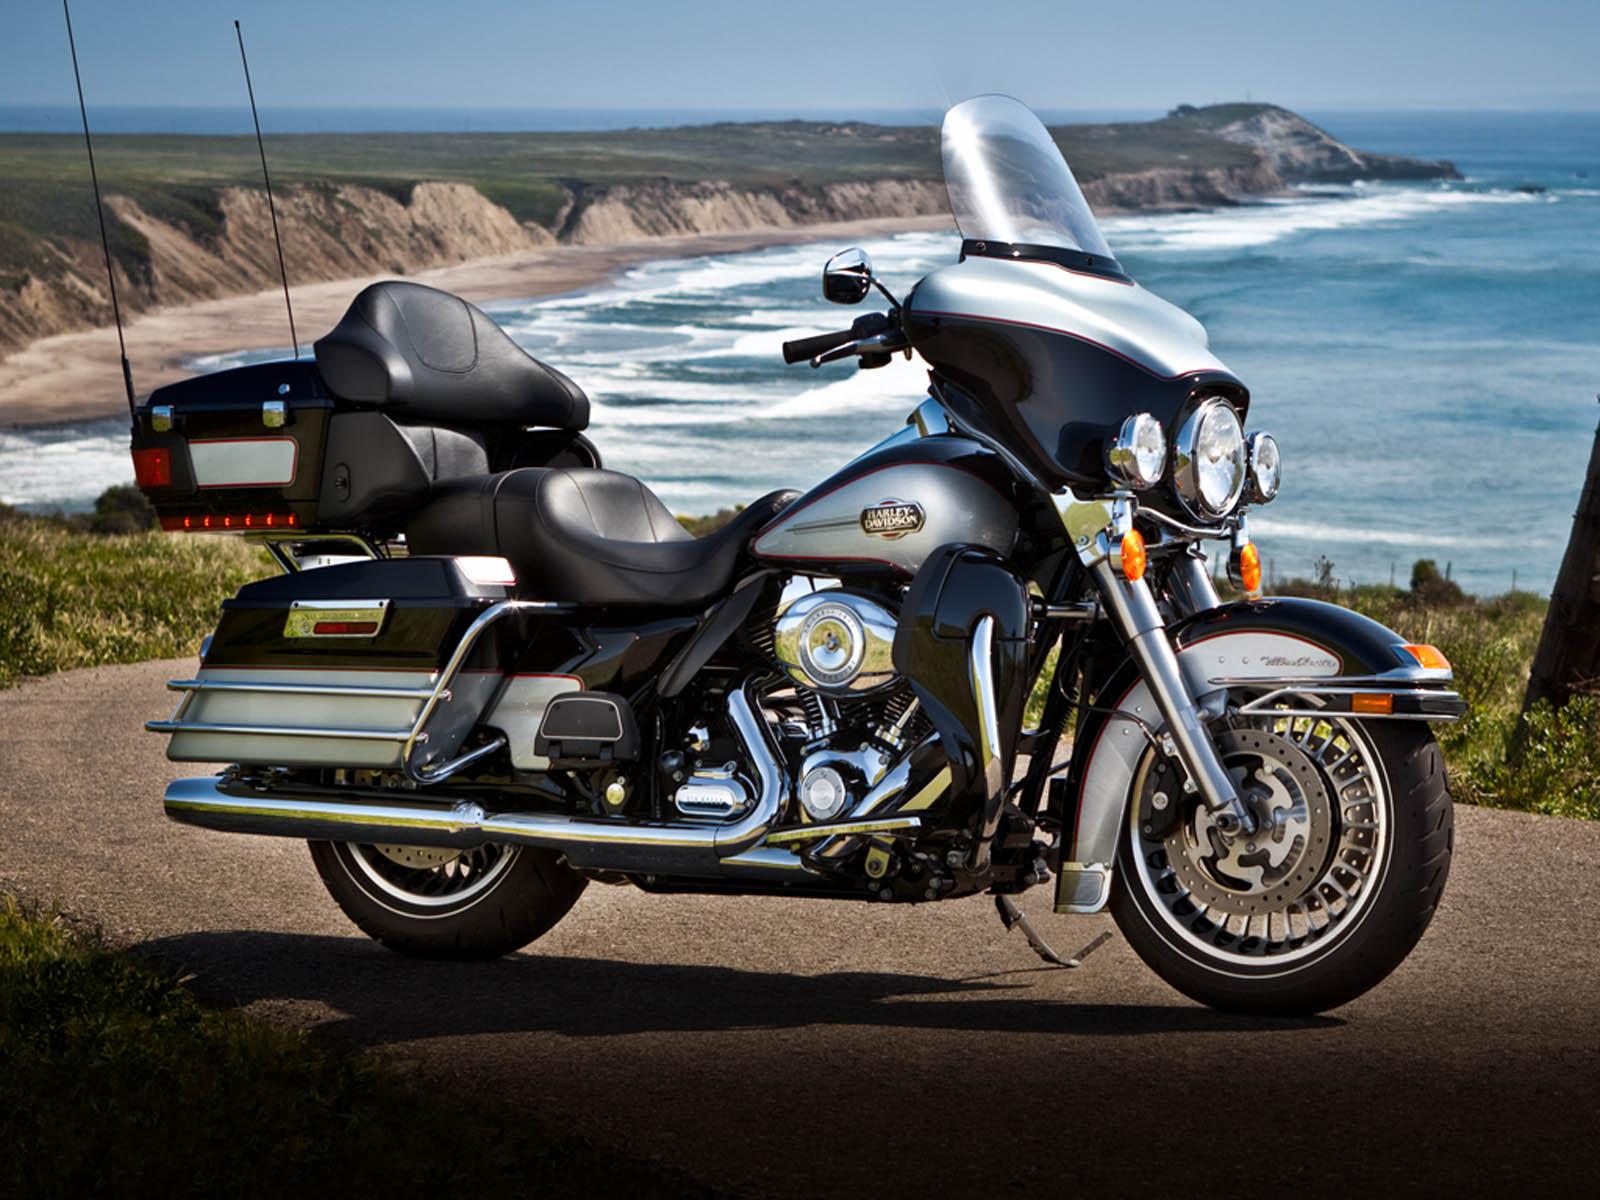 motorcycle harley street glide wallpaper - photo #38